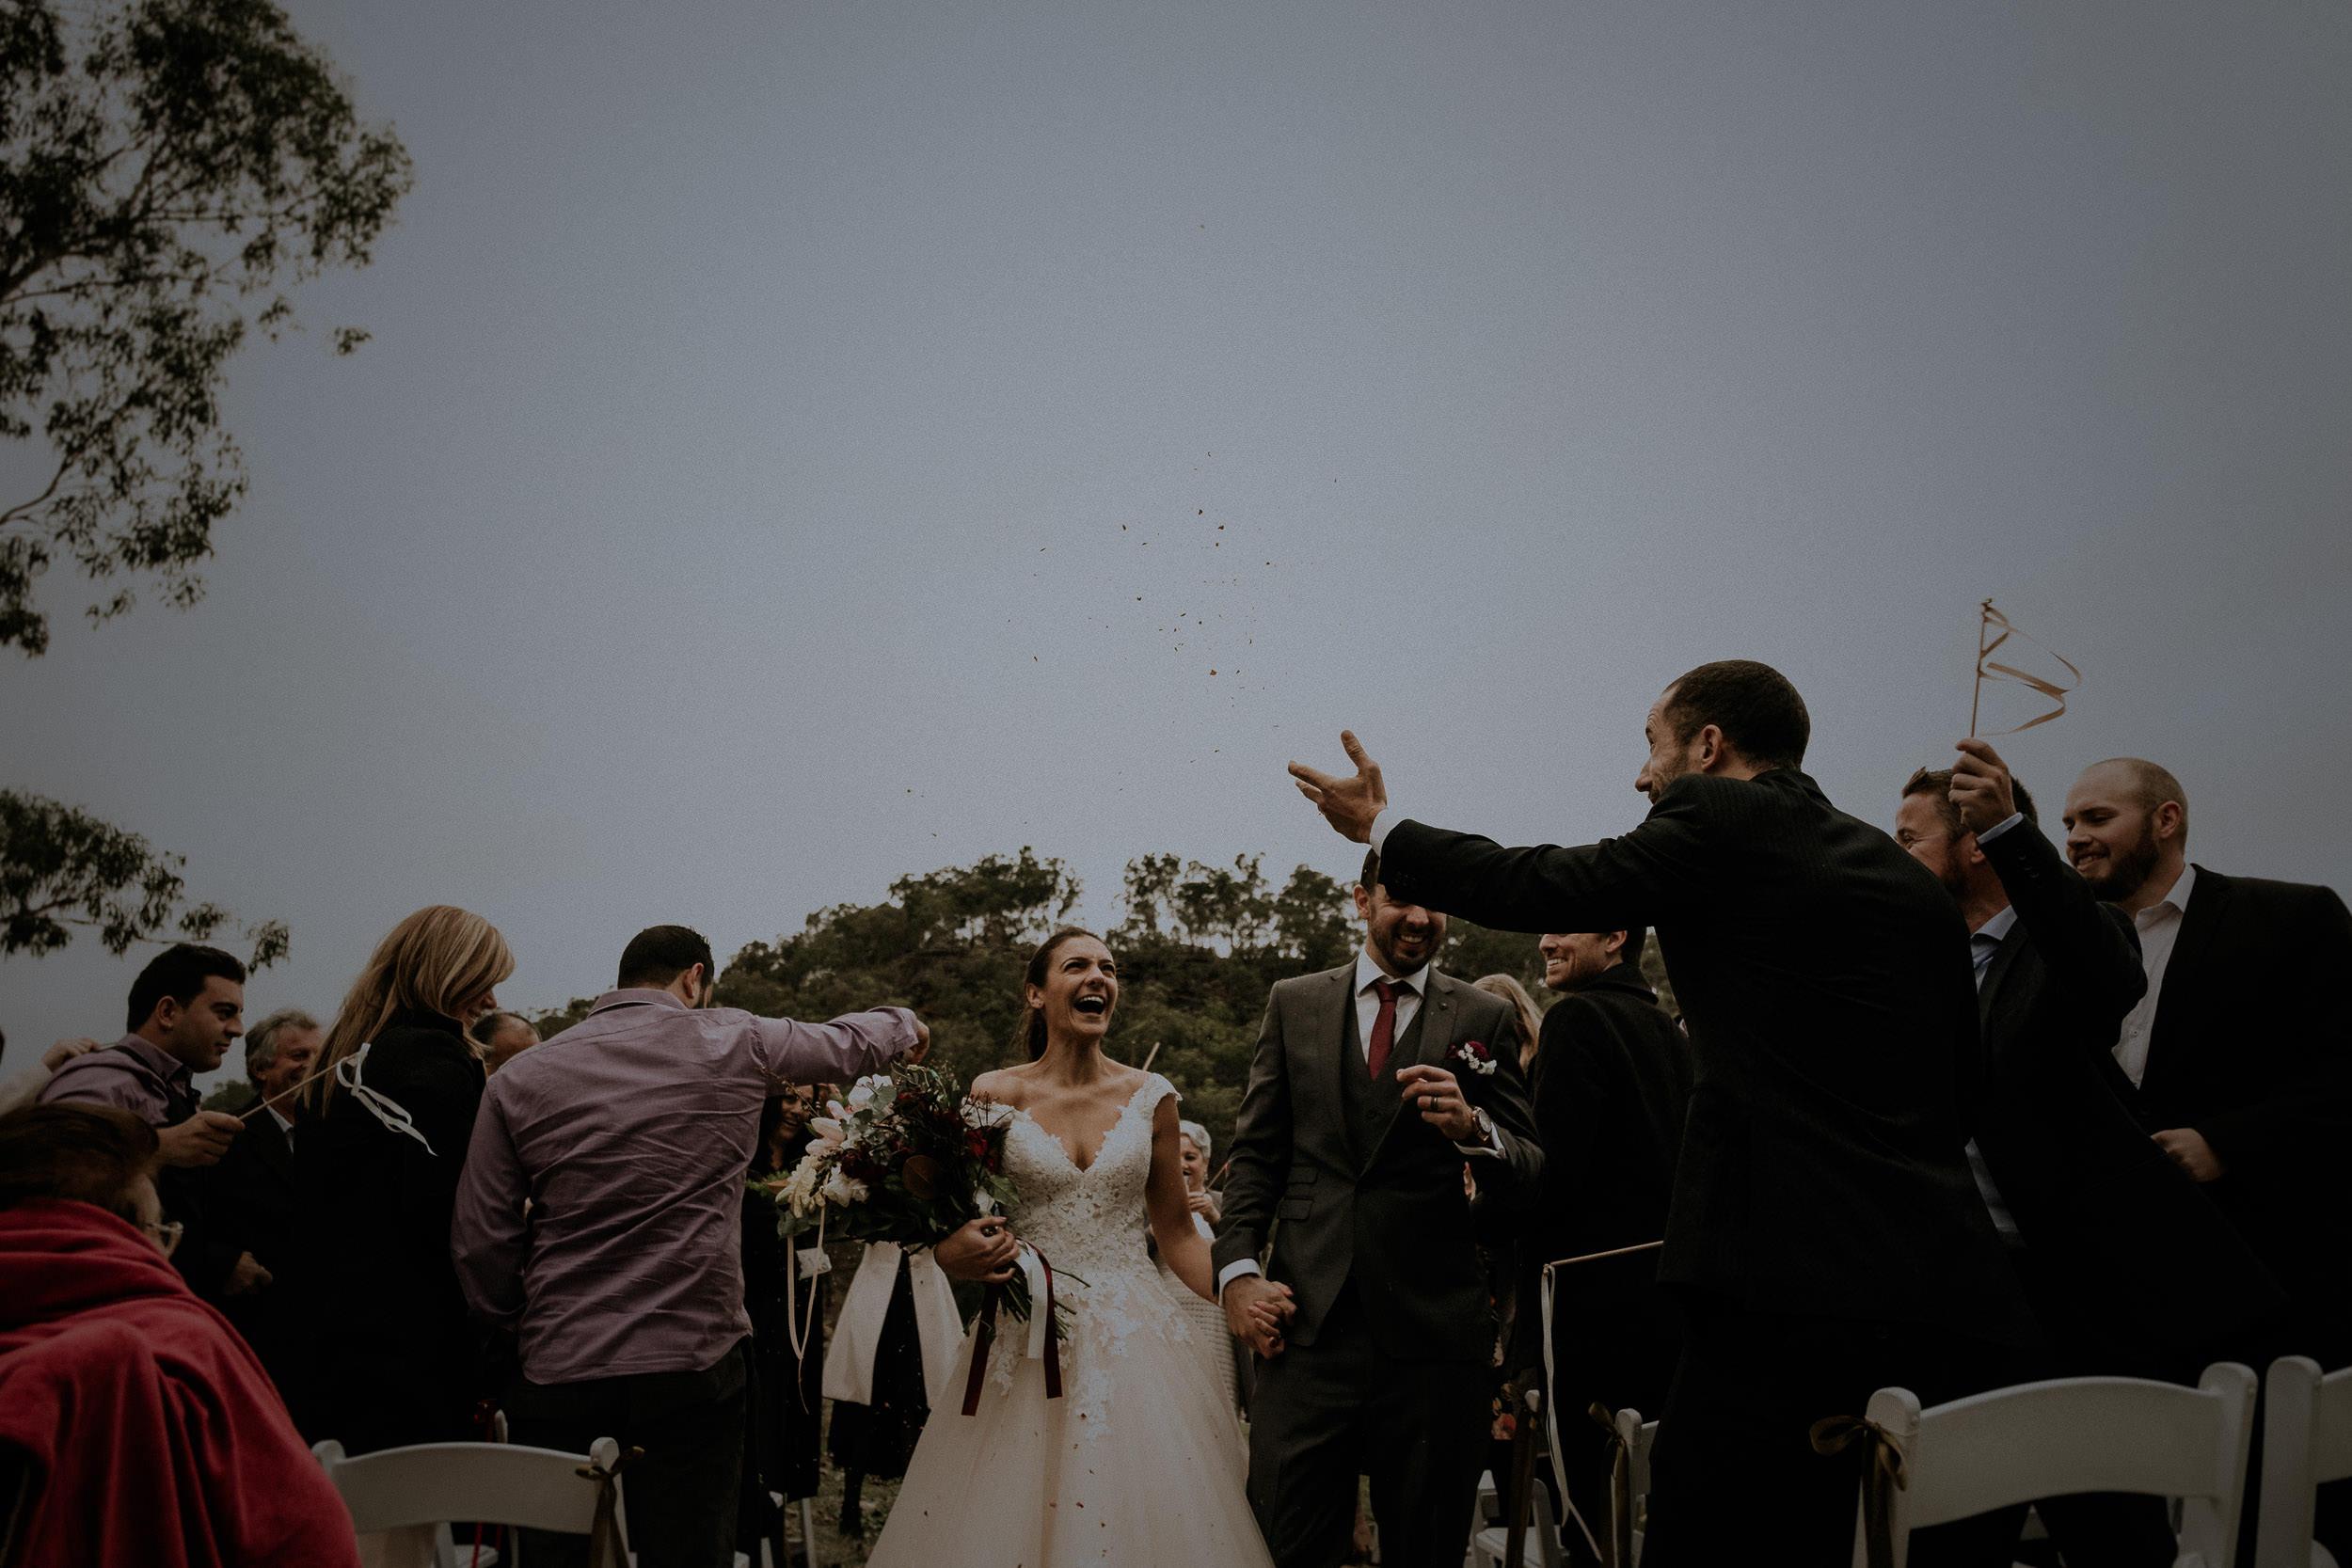 g_c wedding - kings _ thieves elopement wedding photography - blog 58.jpg